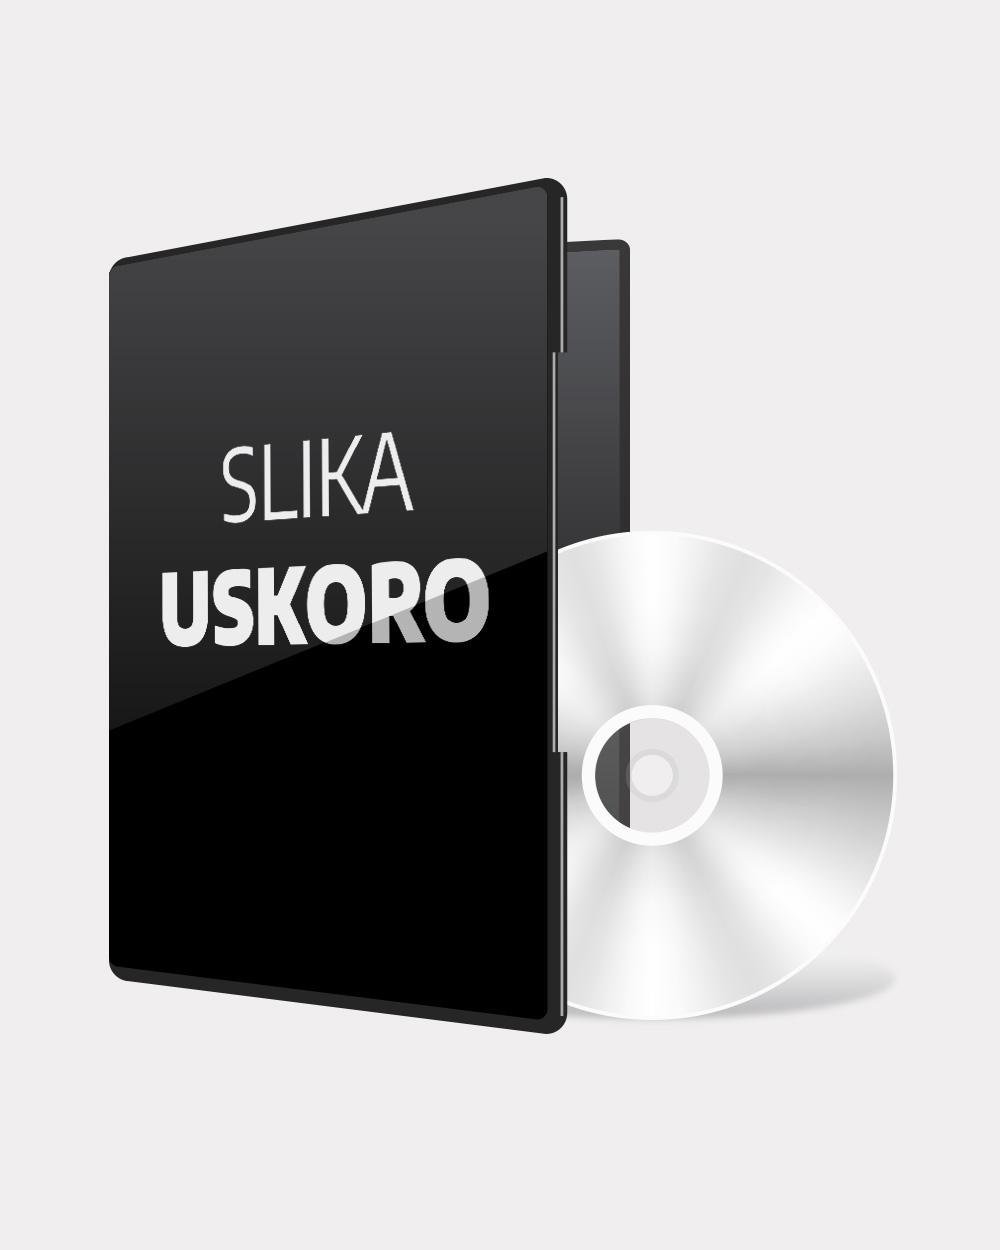 PS4 Fruit Ninja VR